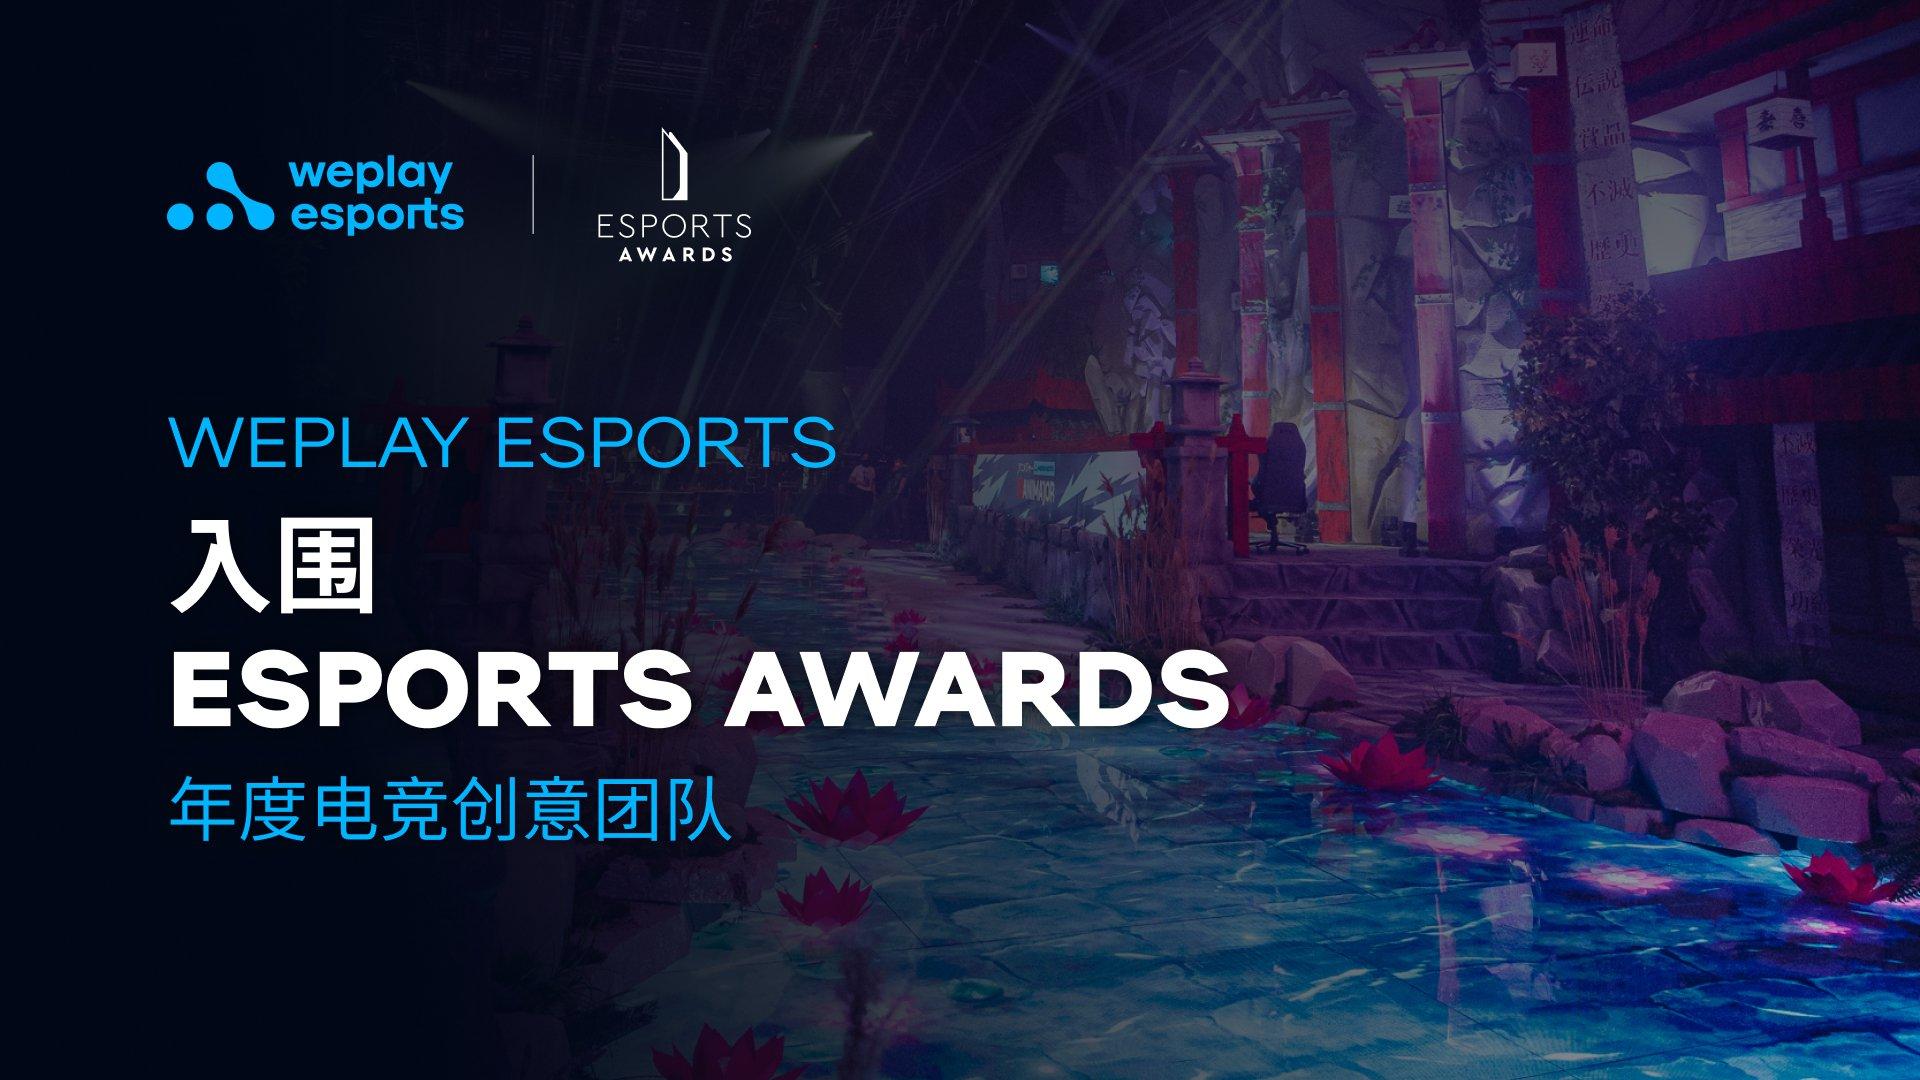 WePlay Esports 入围 Esports Awards. 照片: WePlay Holding